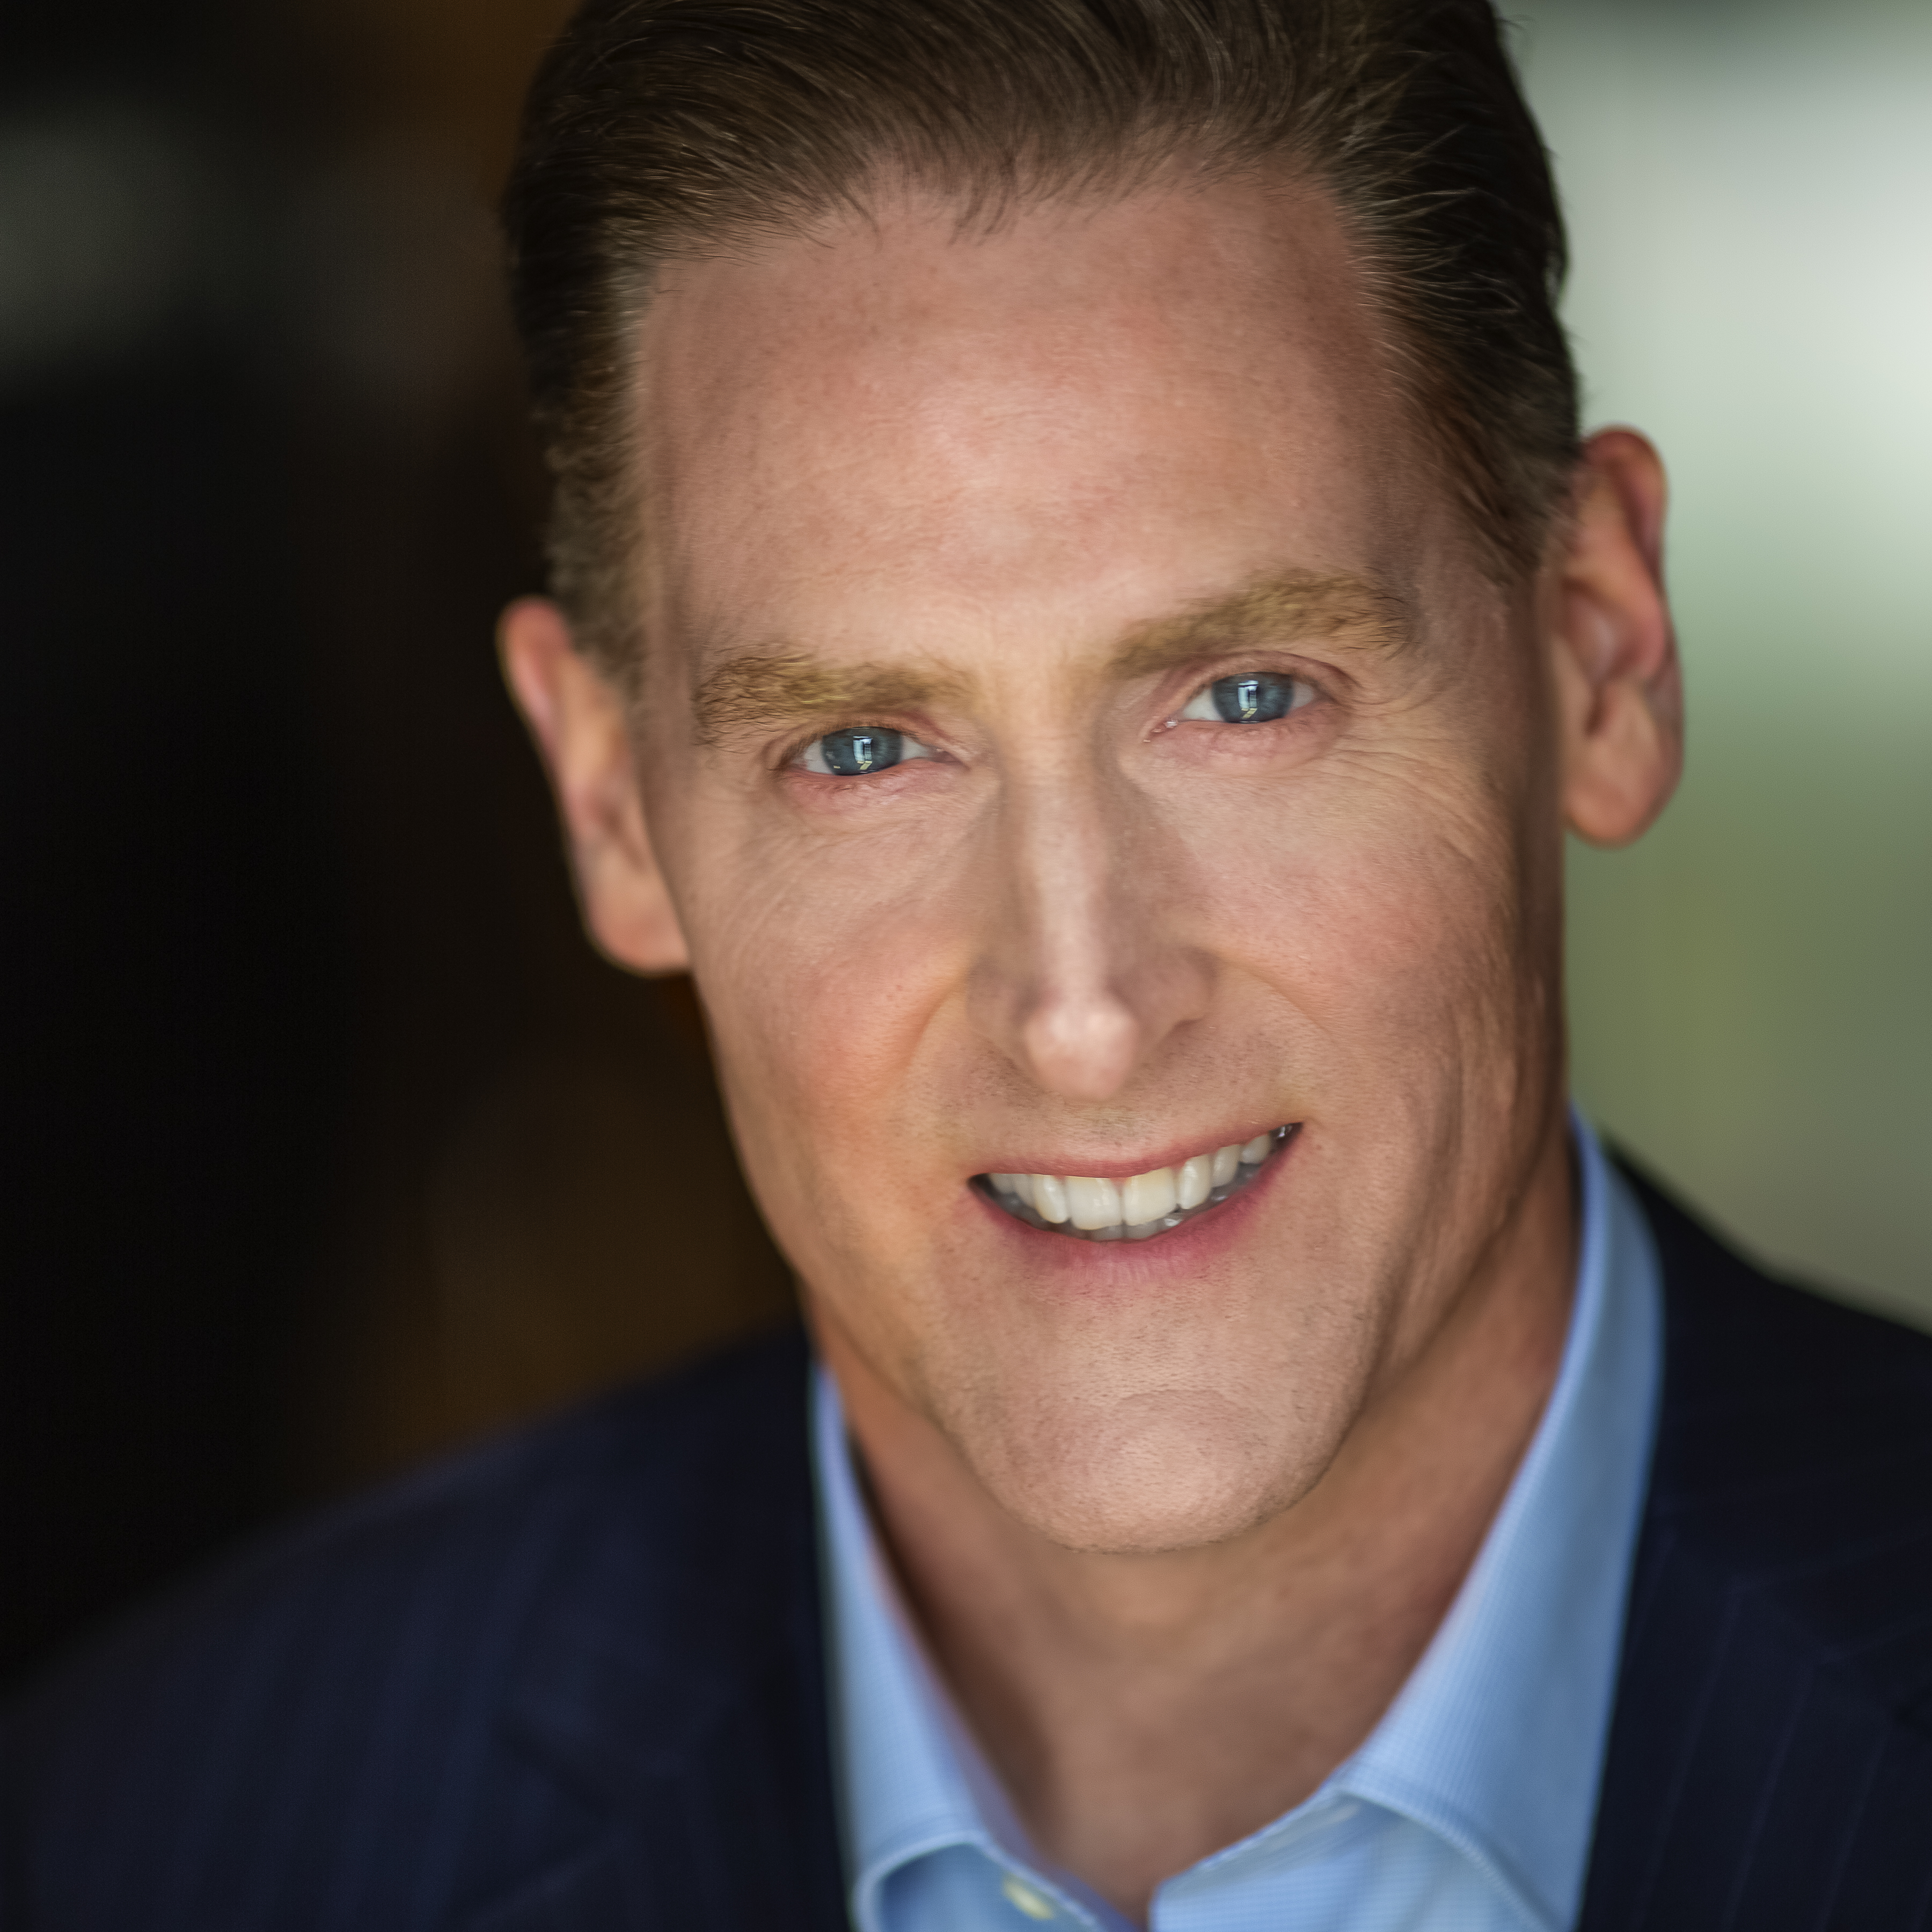 David Reimer, CEO of Merryck